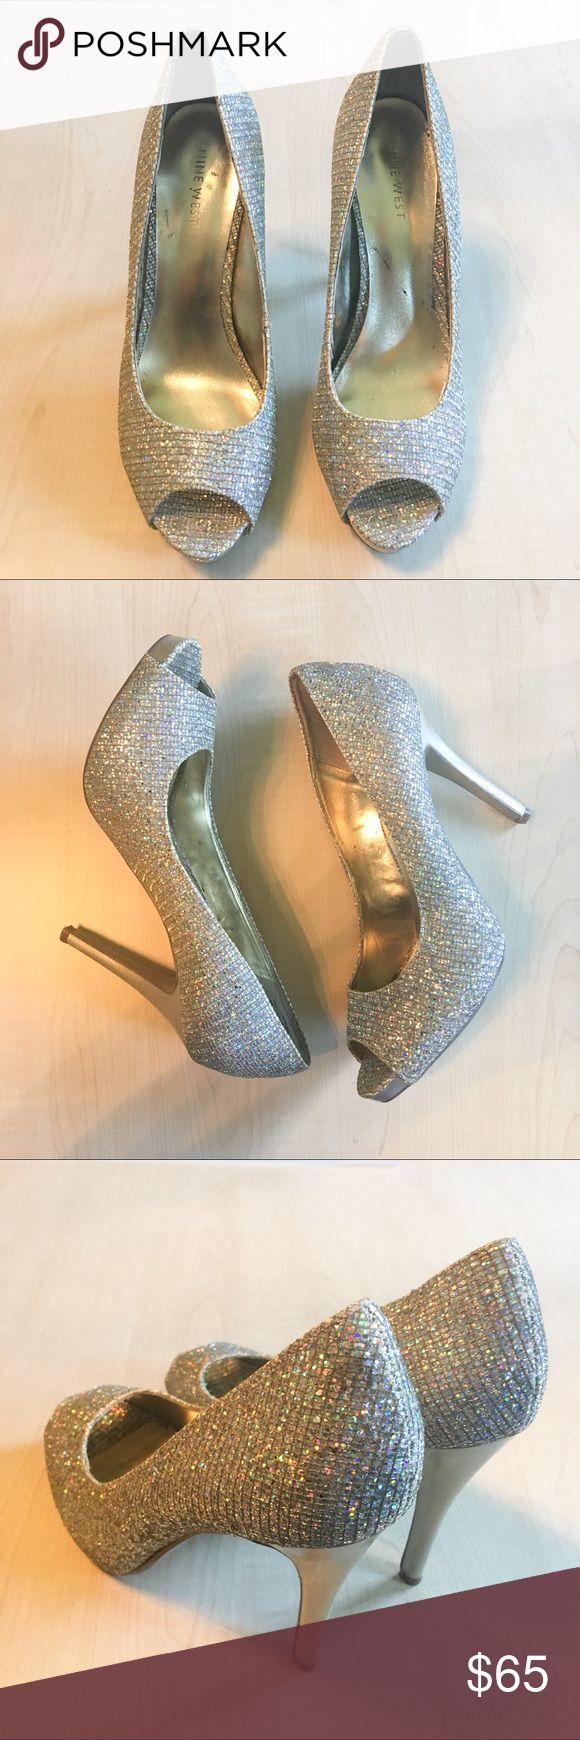 Nine West Liatriso Peep Toe Sparkle Heels Nine West Liatriso Gold Sparkle Pee Toe Heels   -C- Nine West Shoes Heels